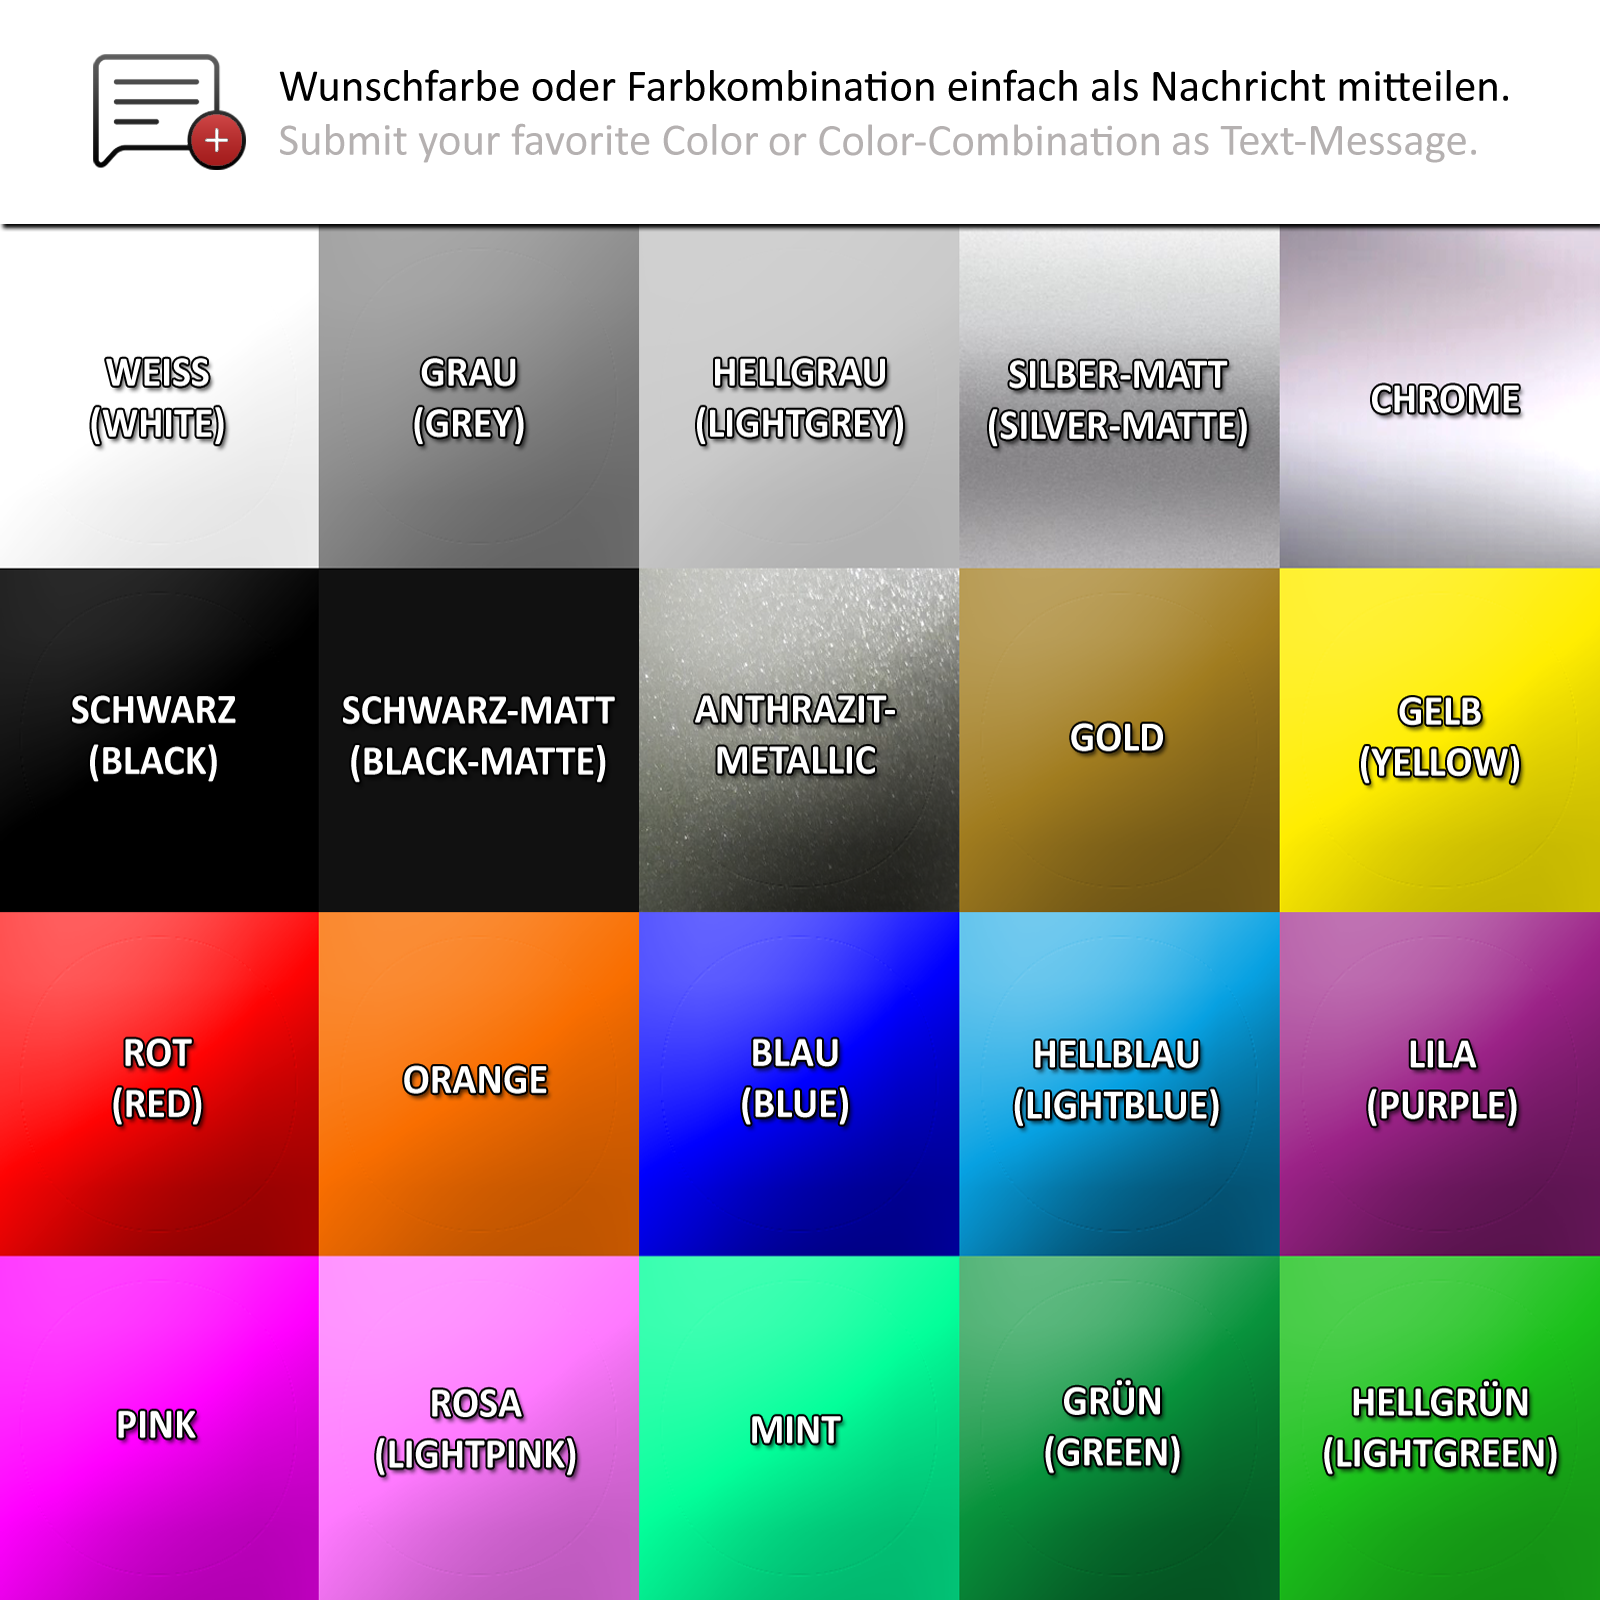 BMW I Love My E46 Compact Sticker 20cm x 8cm Silhouette M3 Tuning EDM